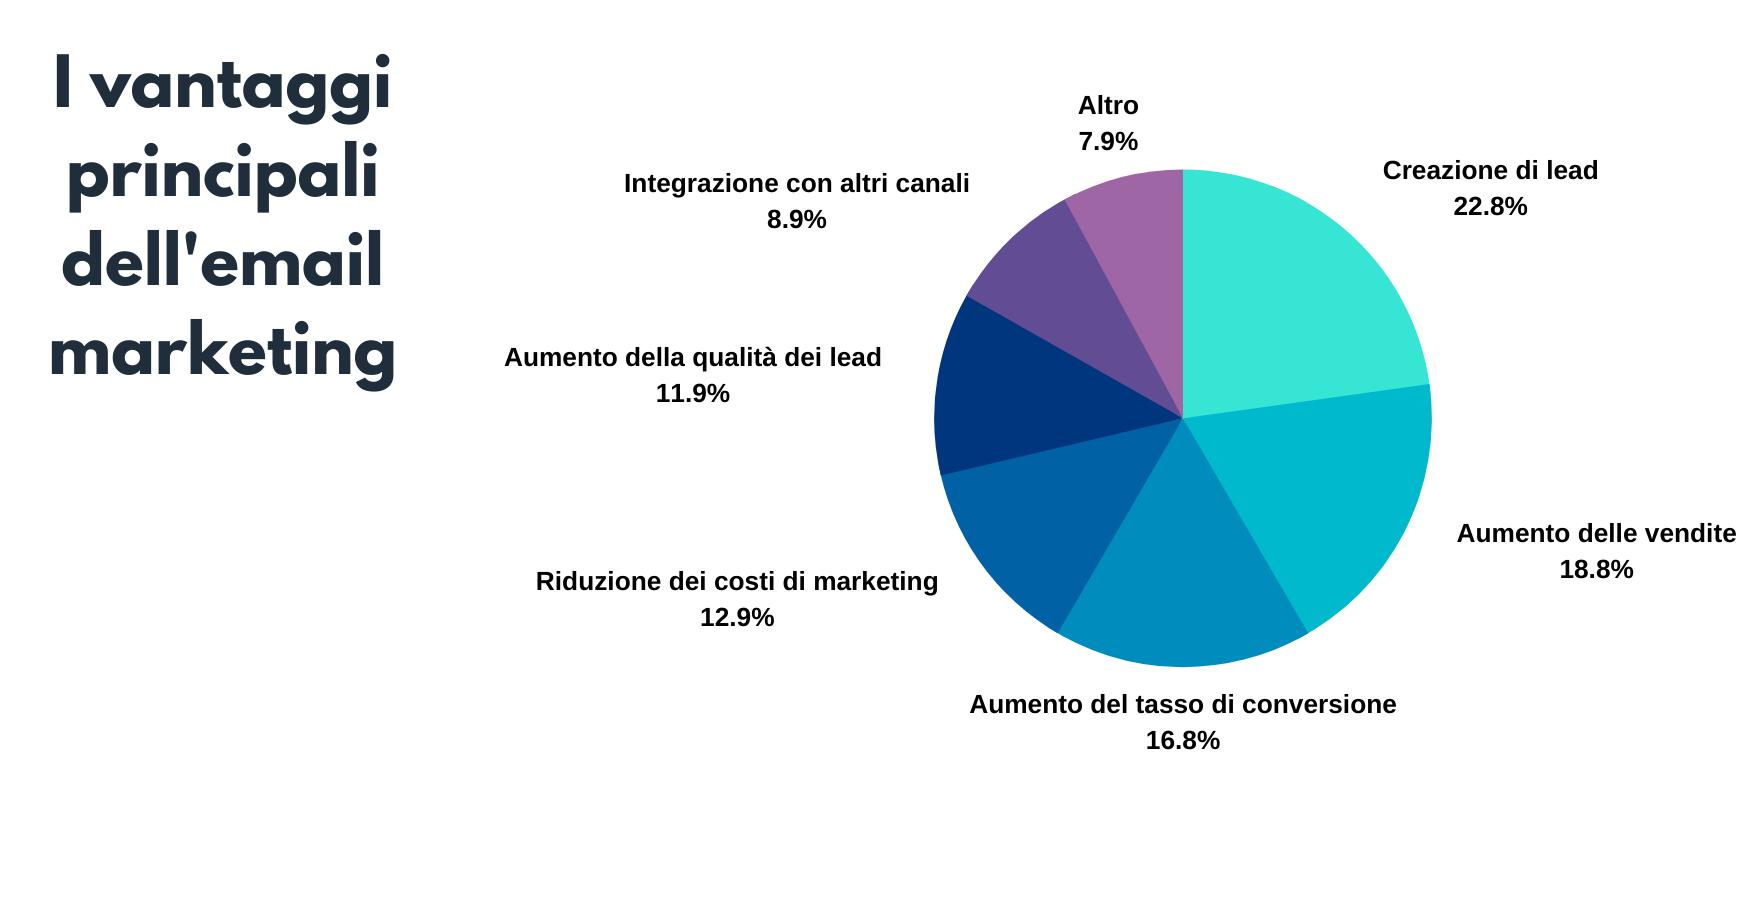 vantaggi dell'email marketing